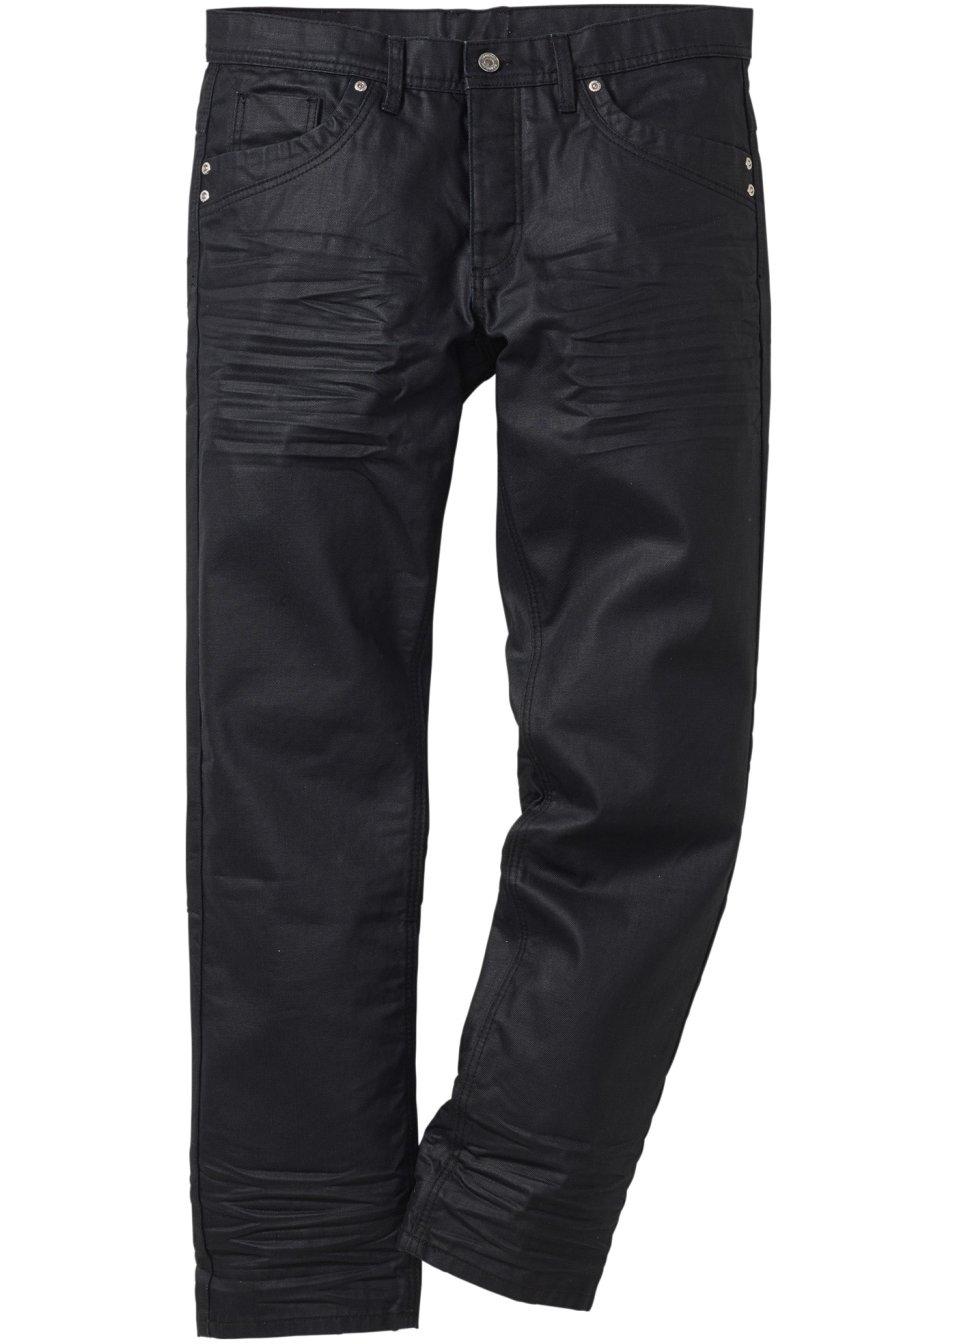 beschichtete jeans mit coolen details schwarz l nge 34. Black Bedroom Furniture Sets. Home Design Ideas